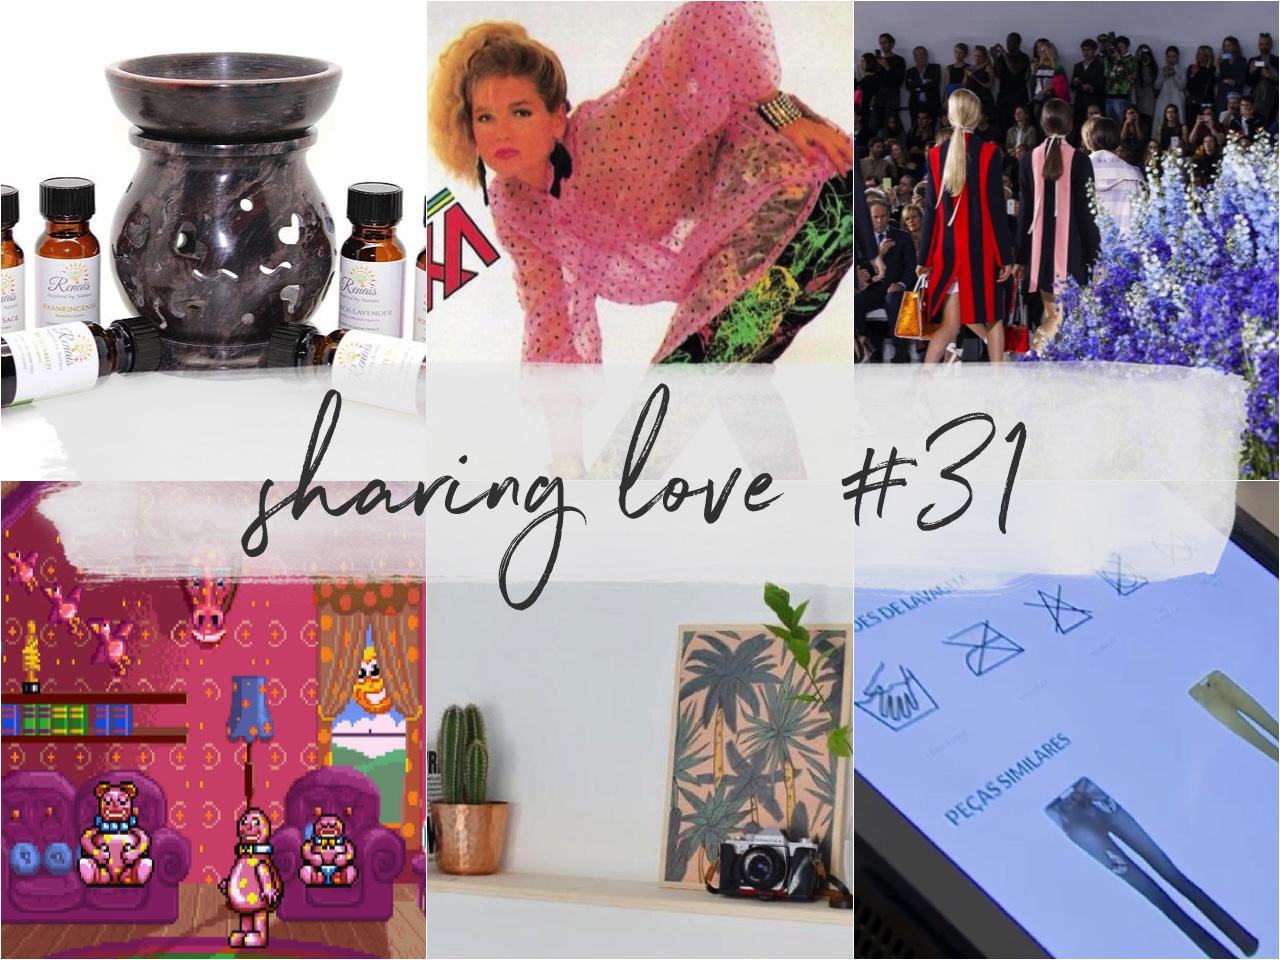 Sharing Love #31